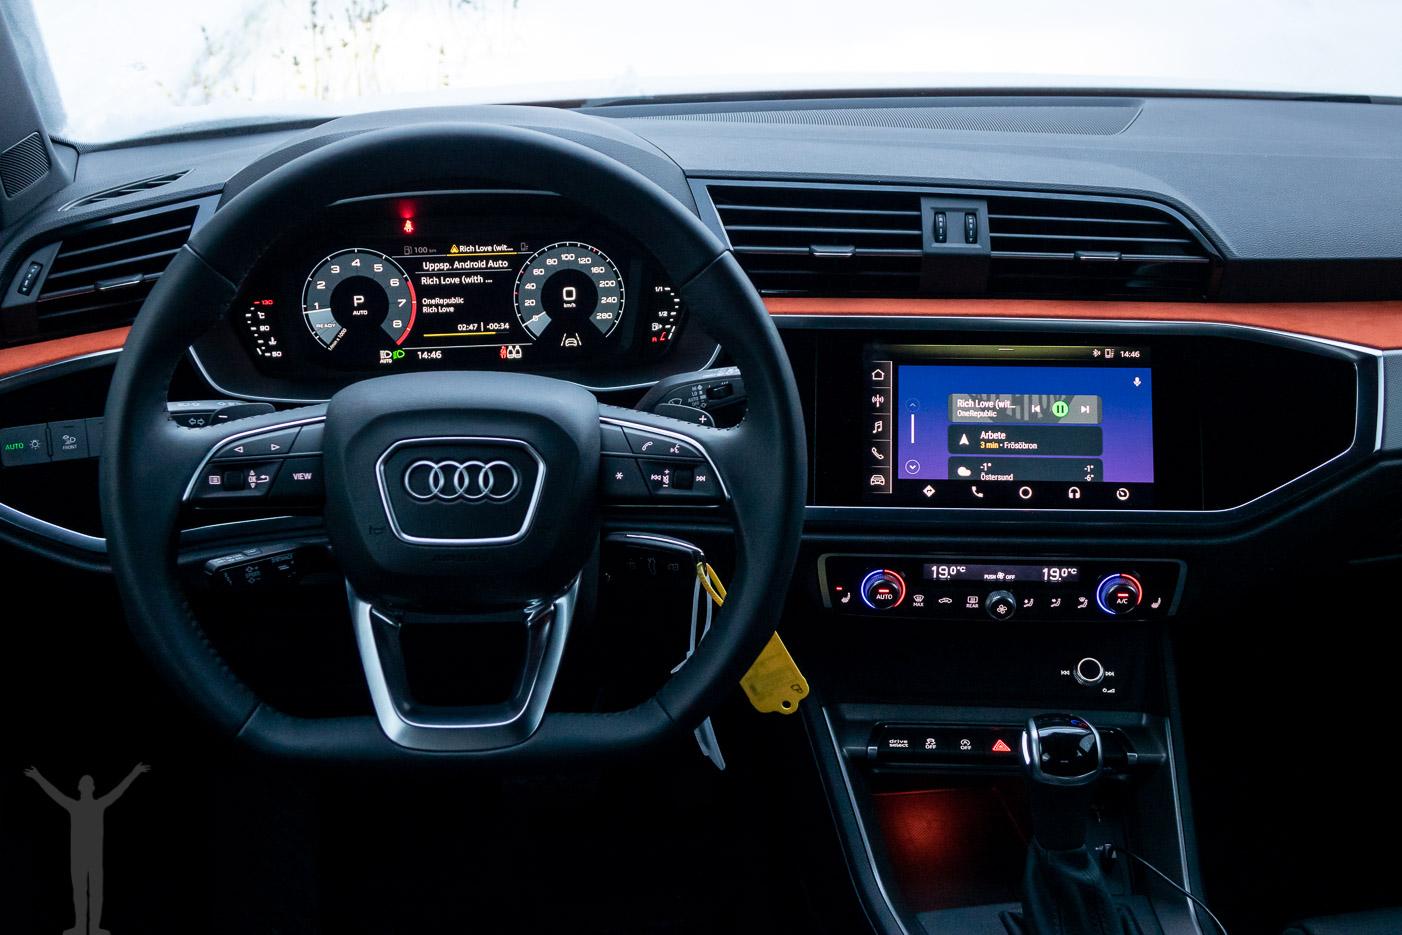 Android Auto på svenska, i en Audi Q3 2019.